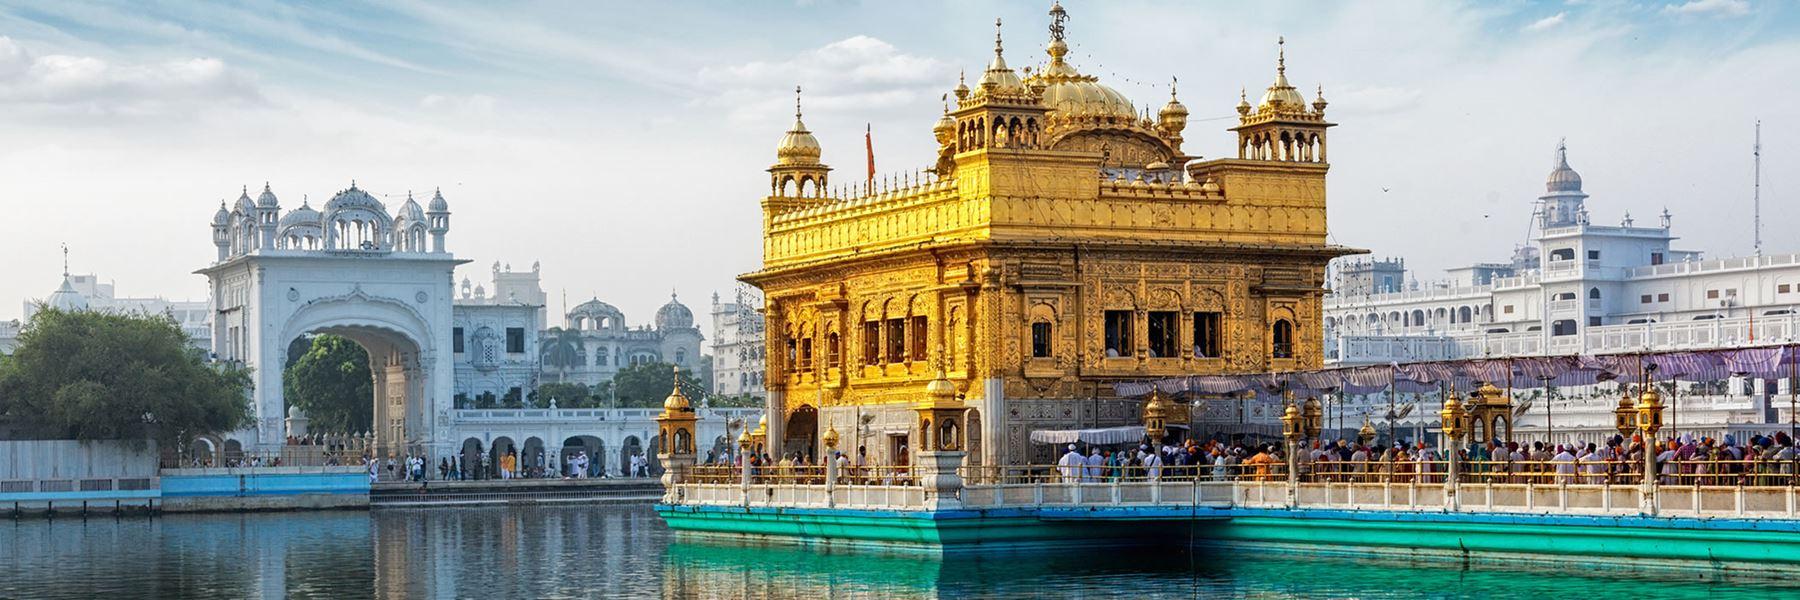 iStock481499068_golden_temple_of_Amritsar_800x2400.jpg